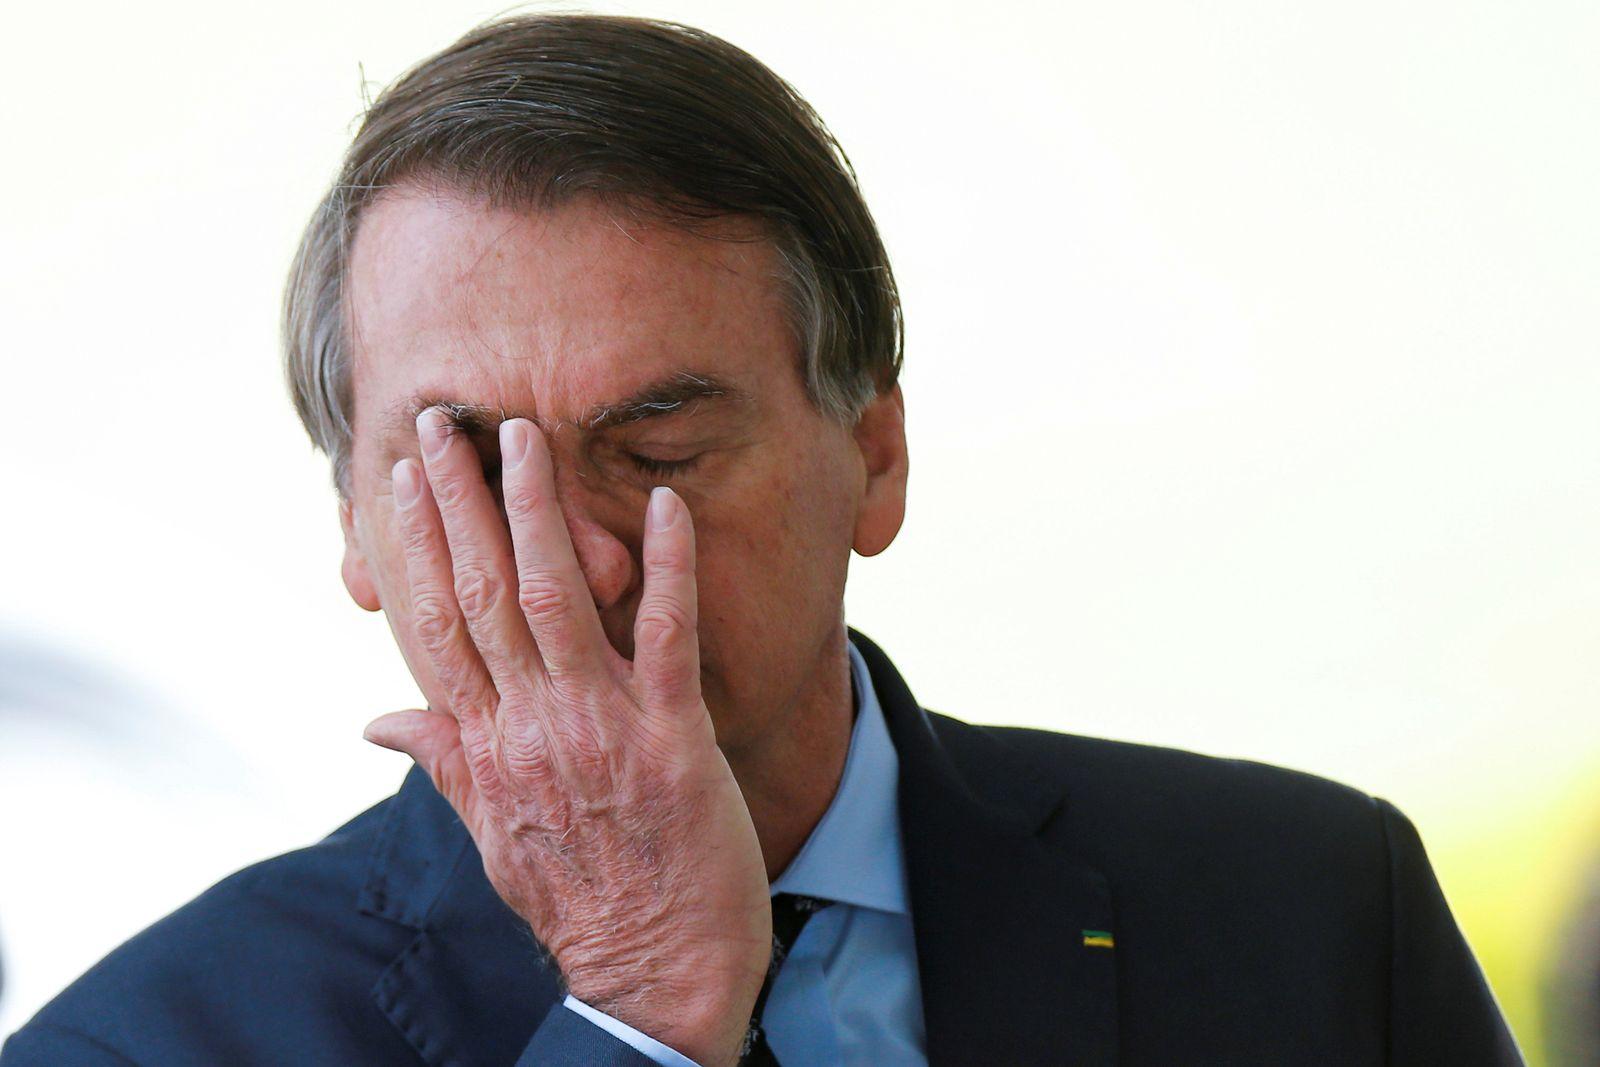 Brazil's President Jair Bolsonaro reacts while meeting supporters as he leaves Alvorada Palace, amid the coronavirus disease (COVID-19) outbreak, in Brasilia